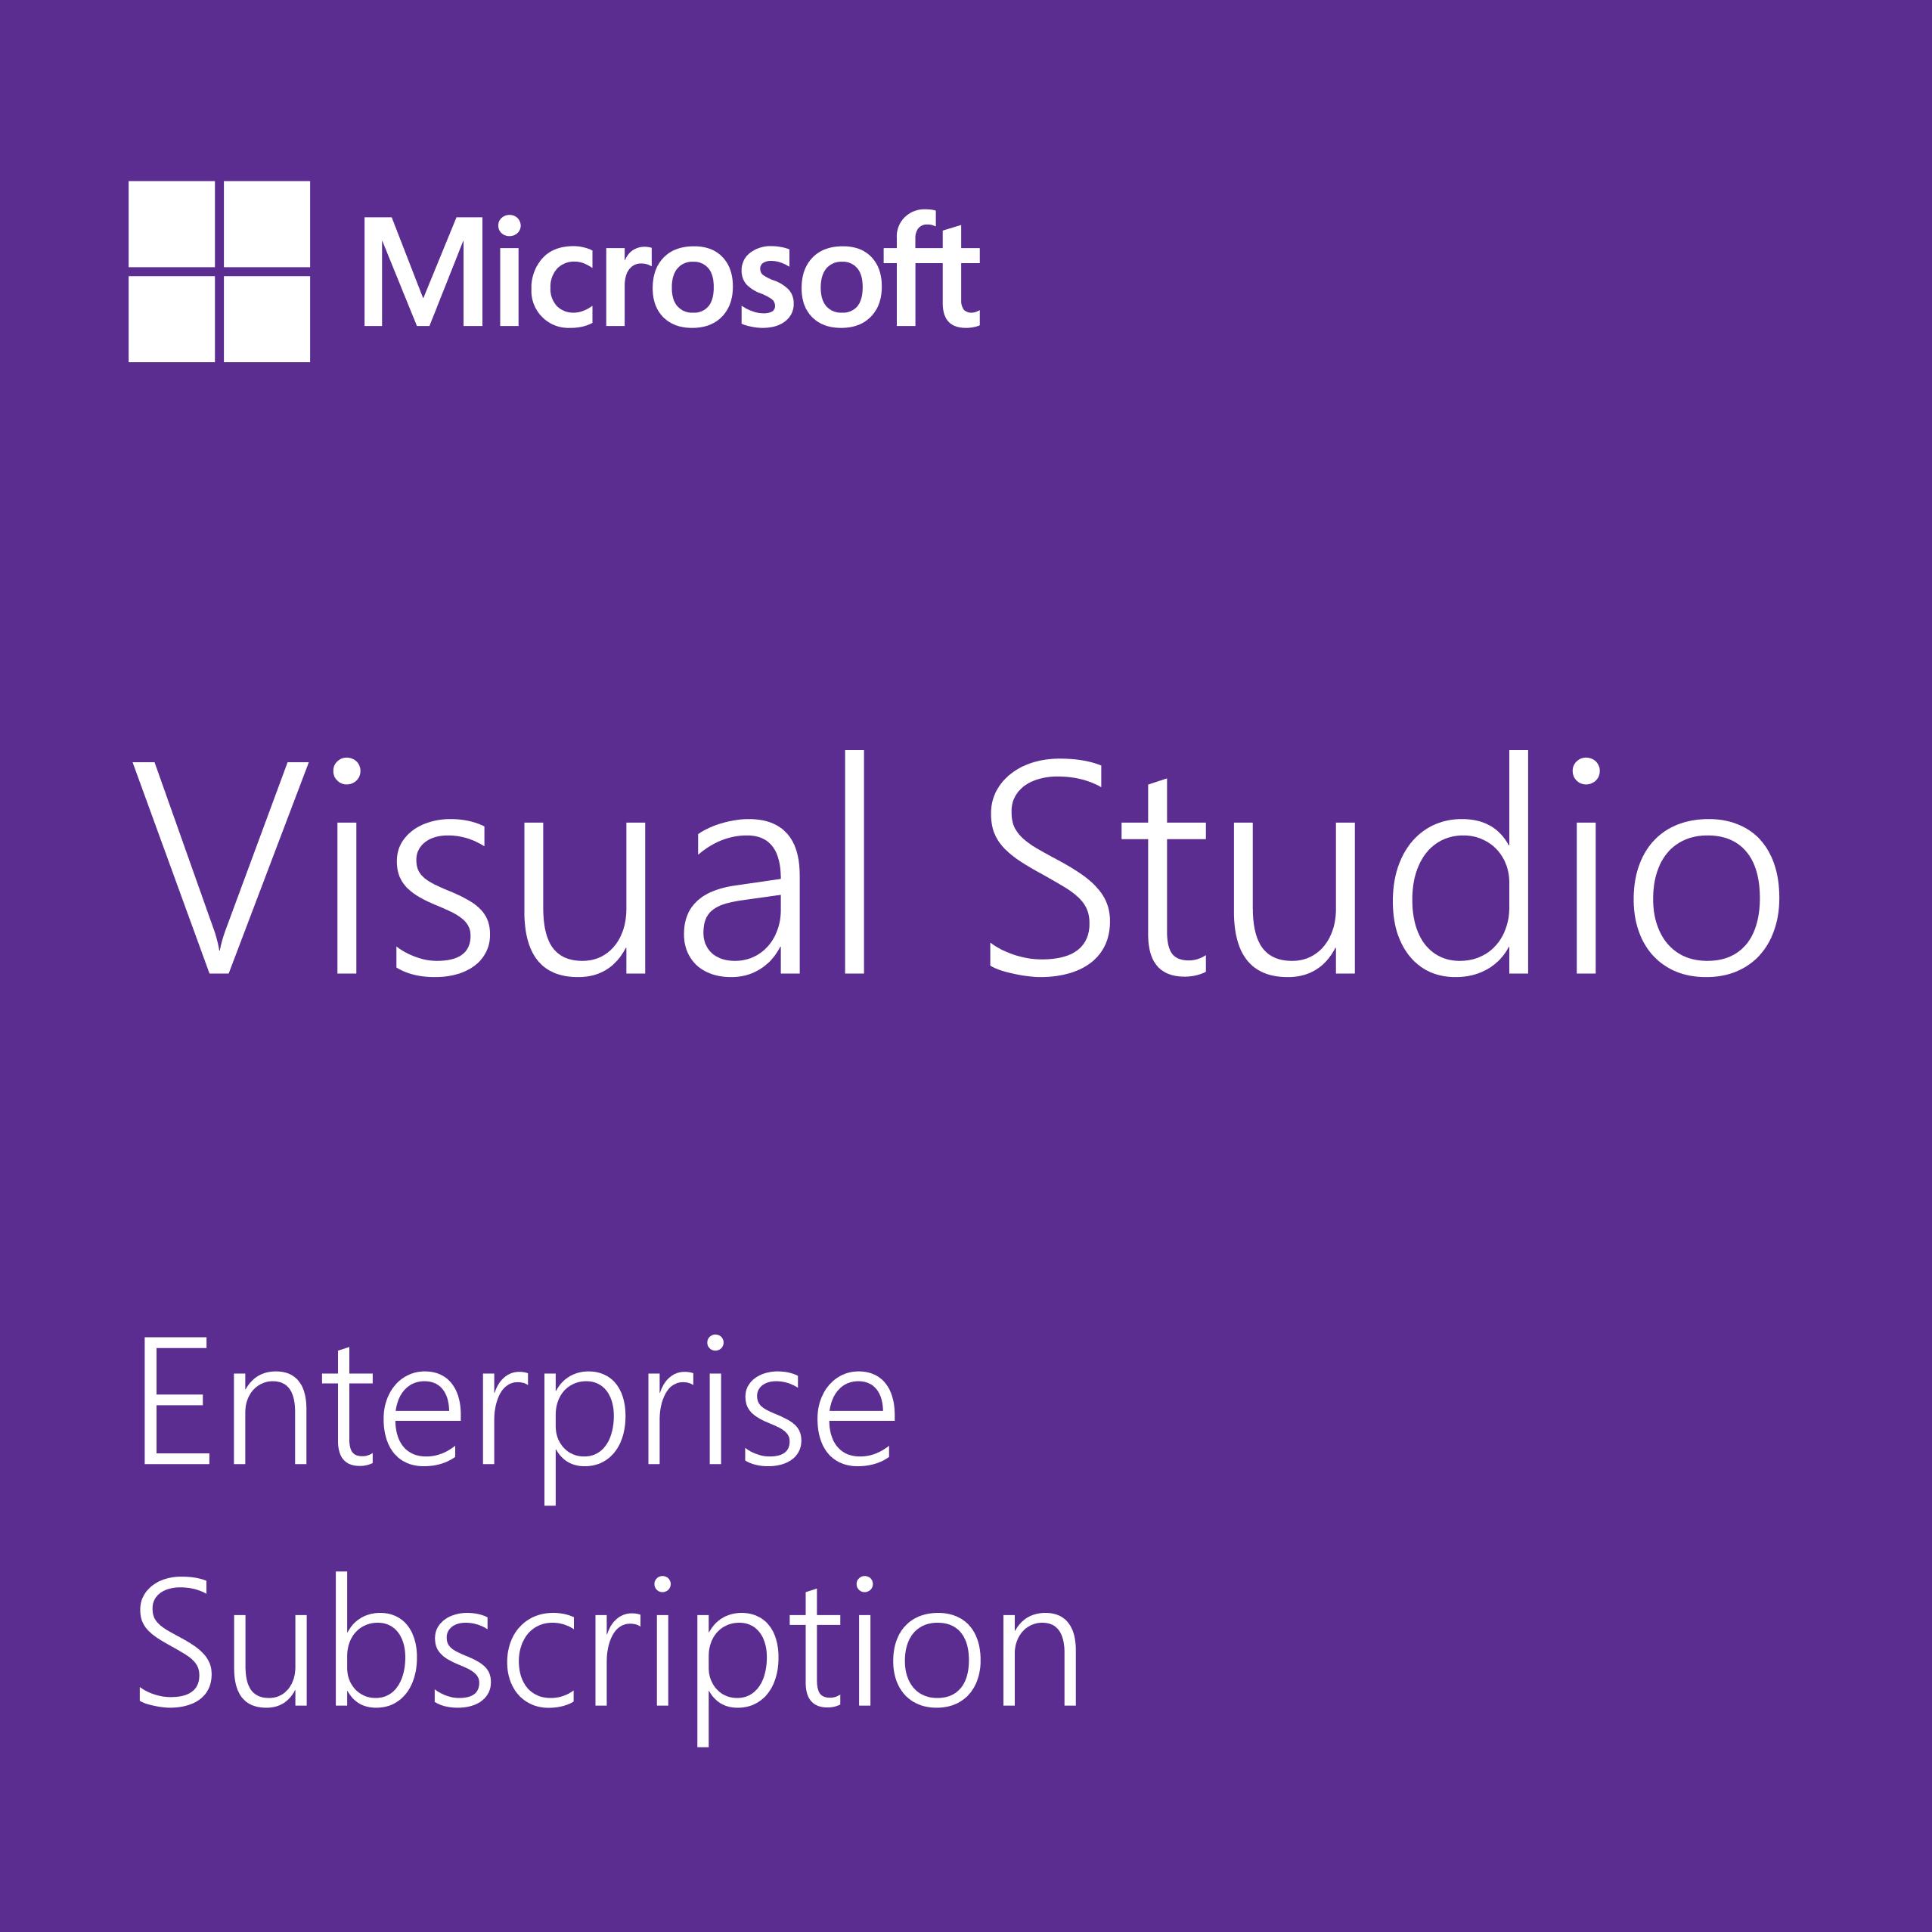 Purchase Microsoft Visual Studio Enterprise Software